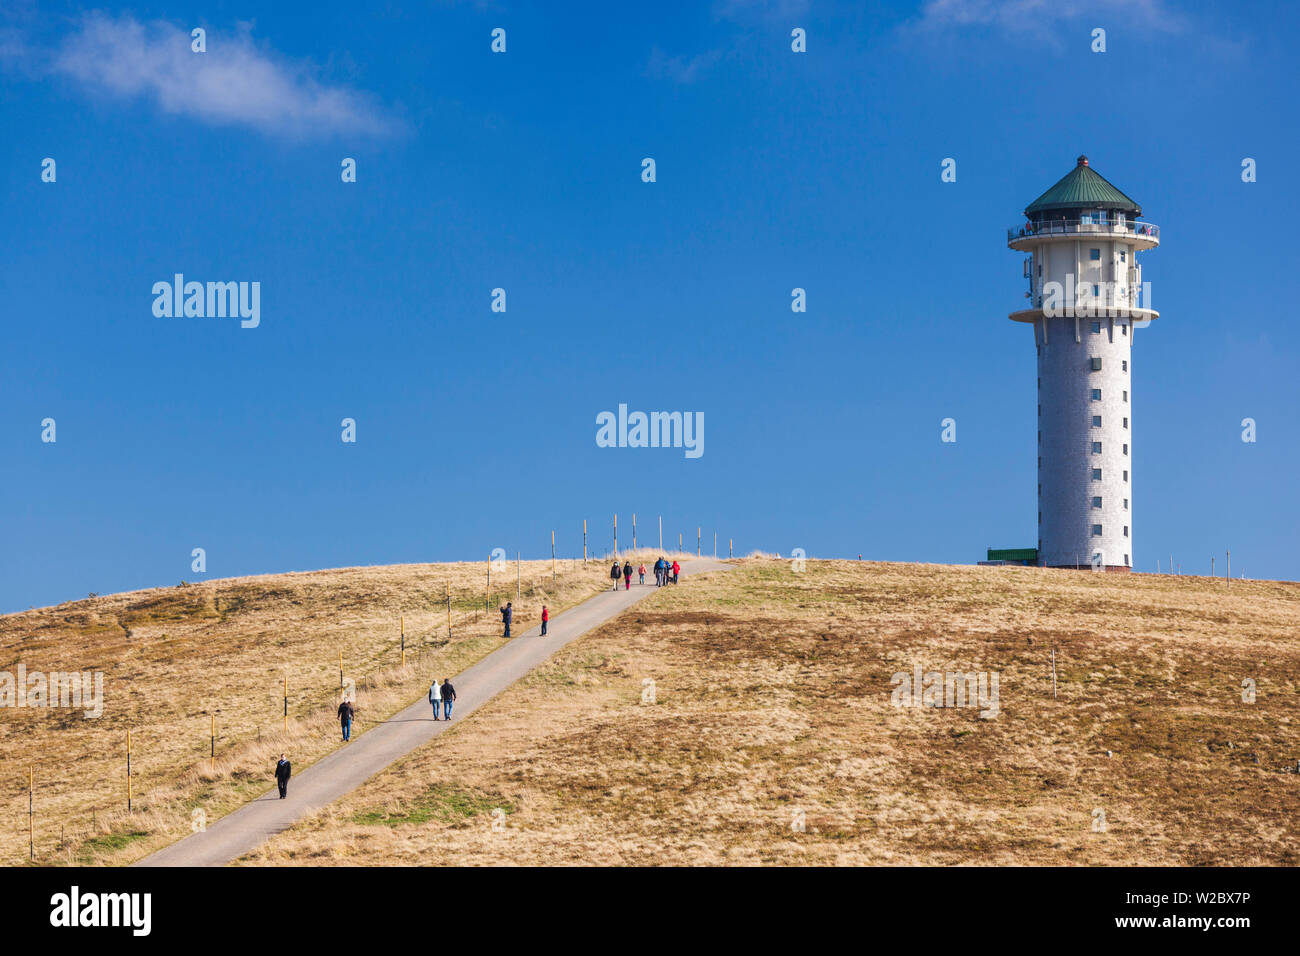 Germany, Baden-Wurttemburg, Black Forest, Feldberg Mountain, mountain lookoout tower Stock Photo